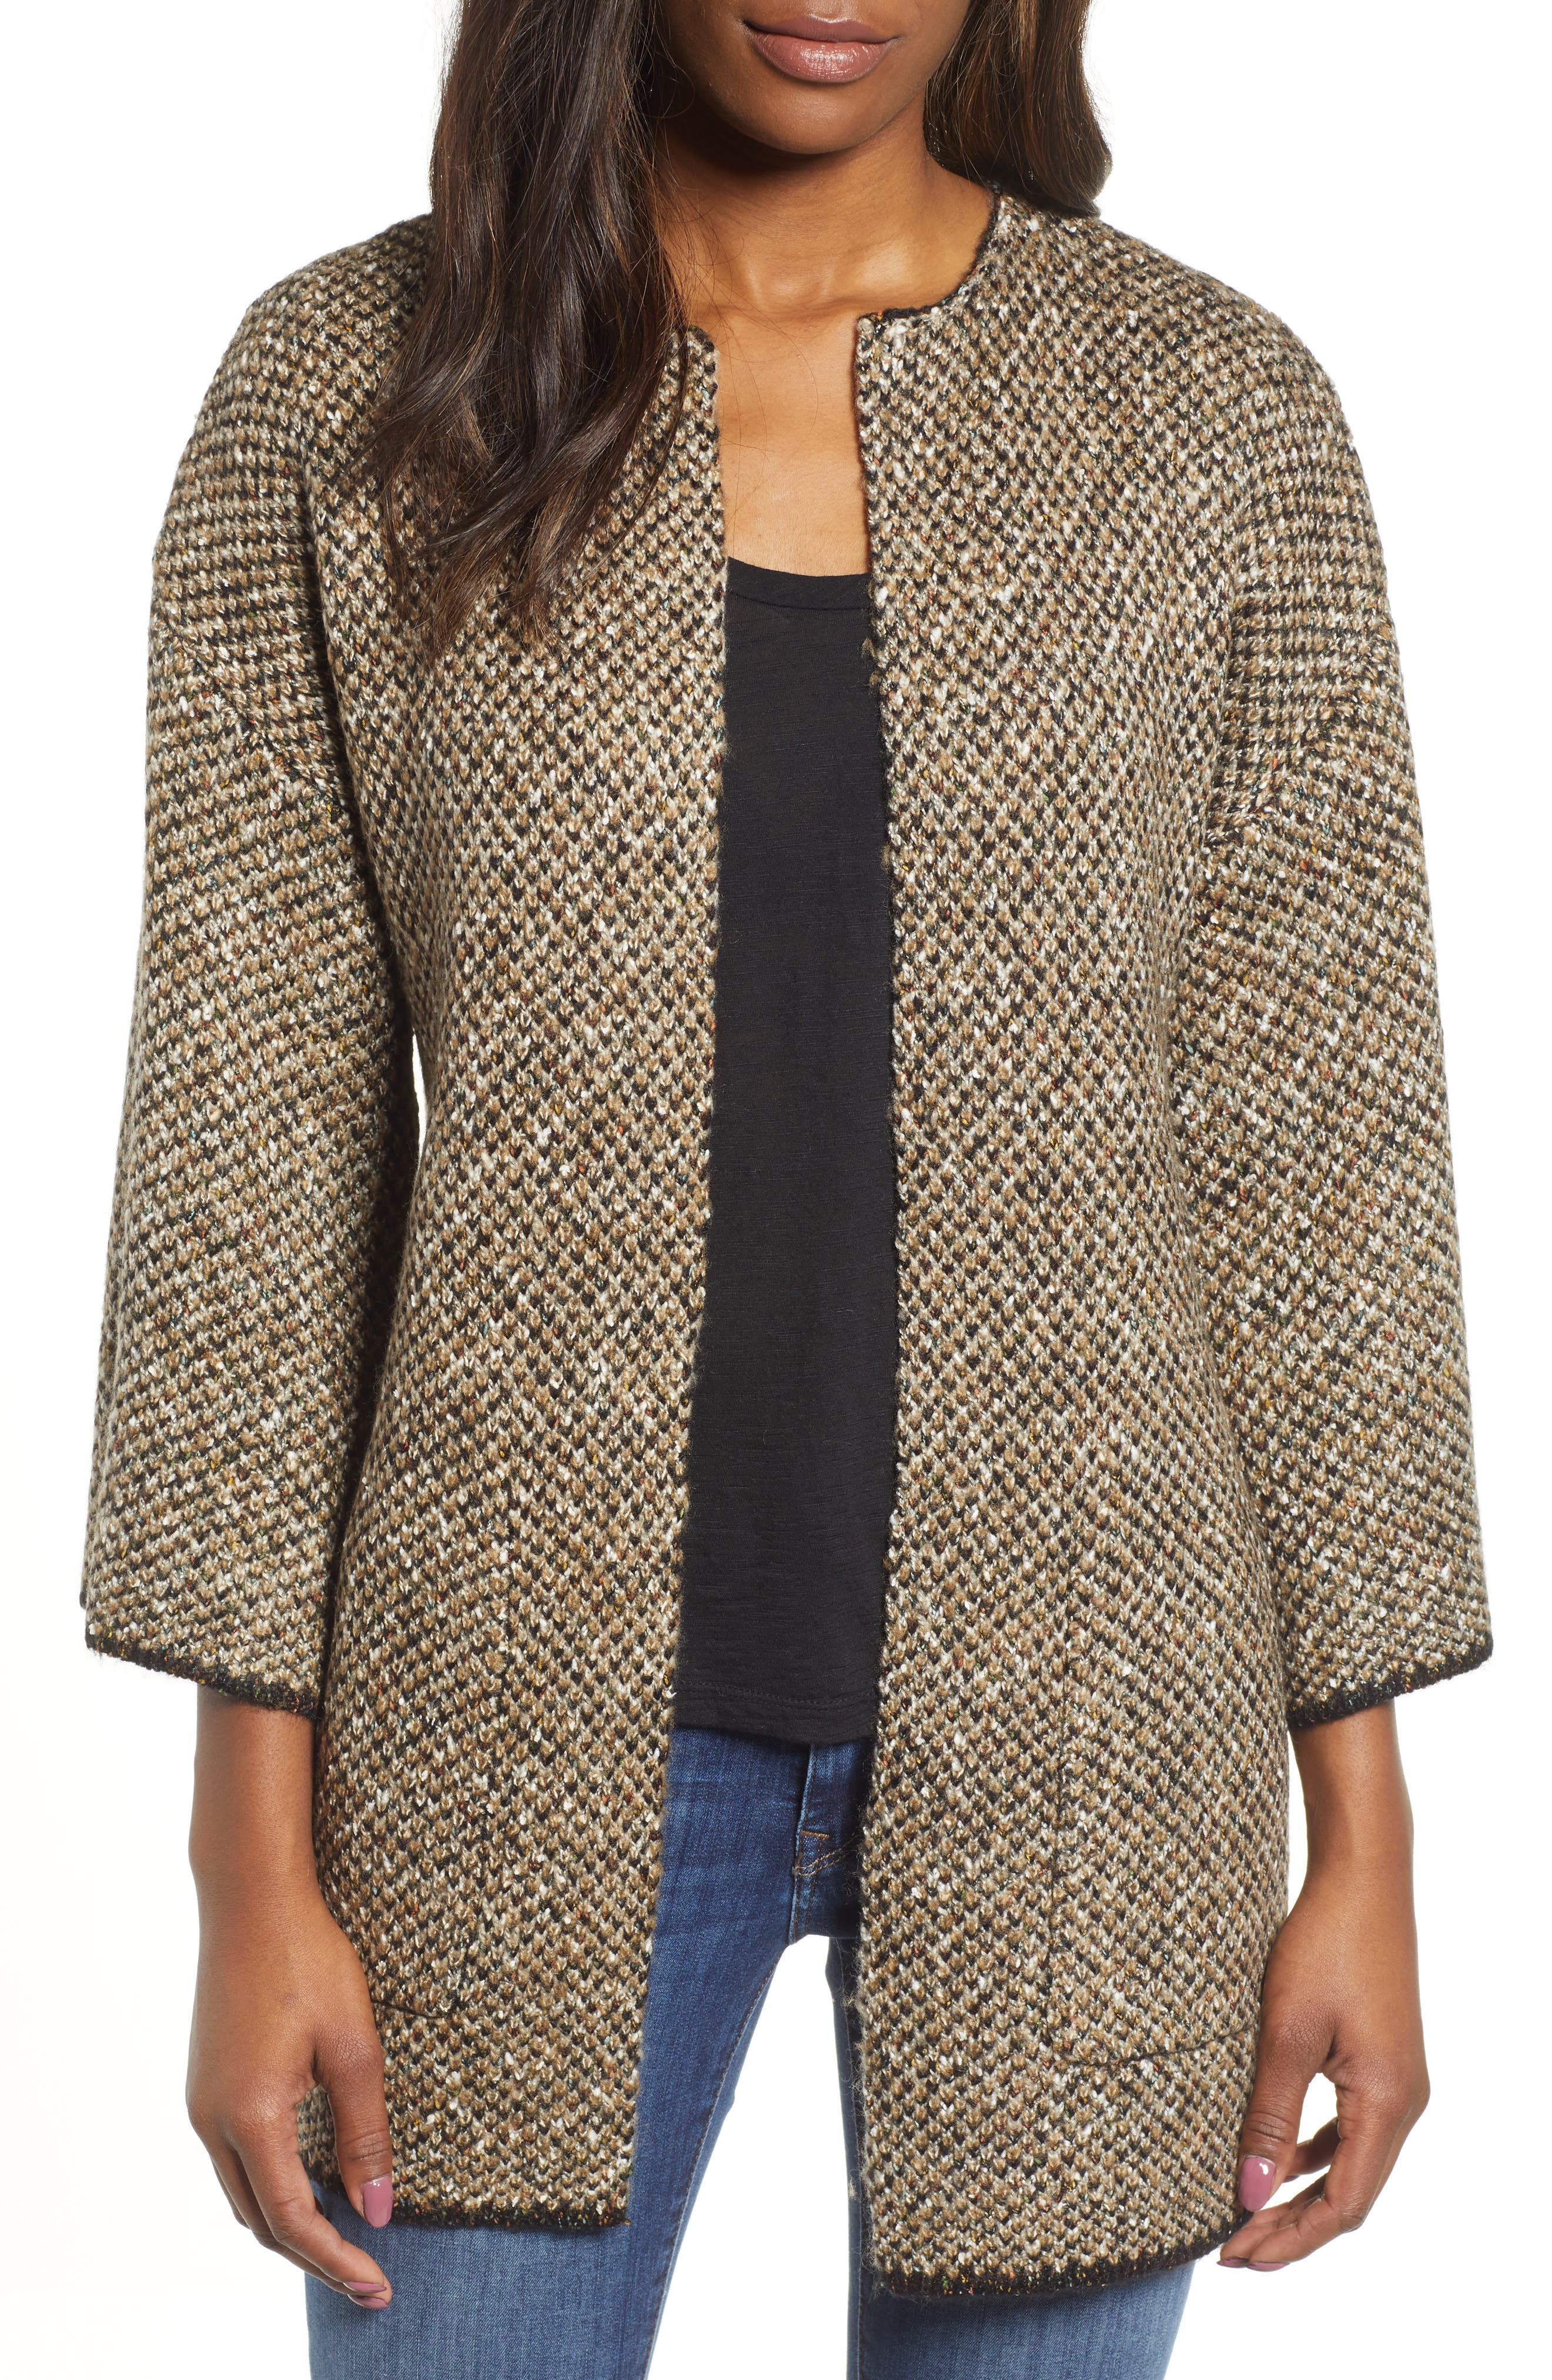 WIT & WISDOM,                             Reversible Tiger Jacquard Sweater Jacket,                             Alternate thumbnail 2, color,                             TAUPE